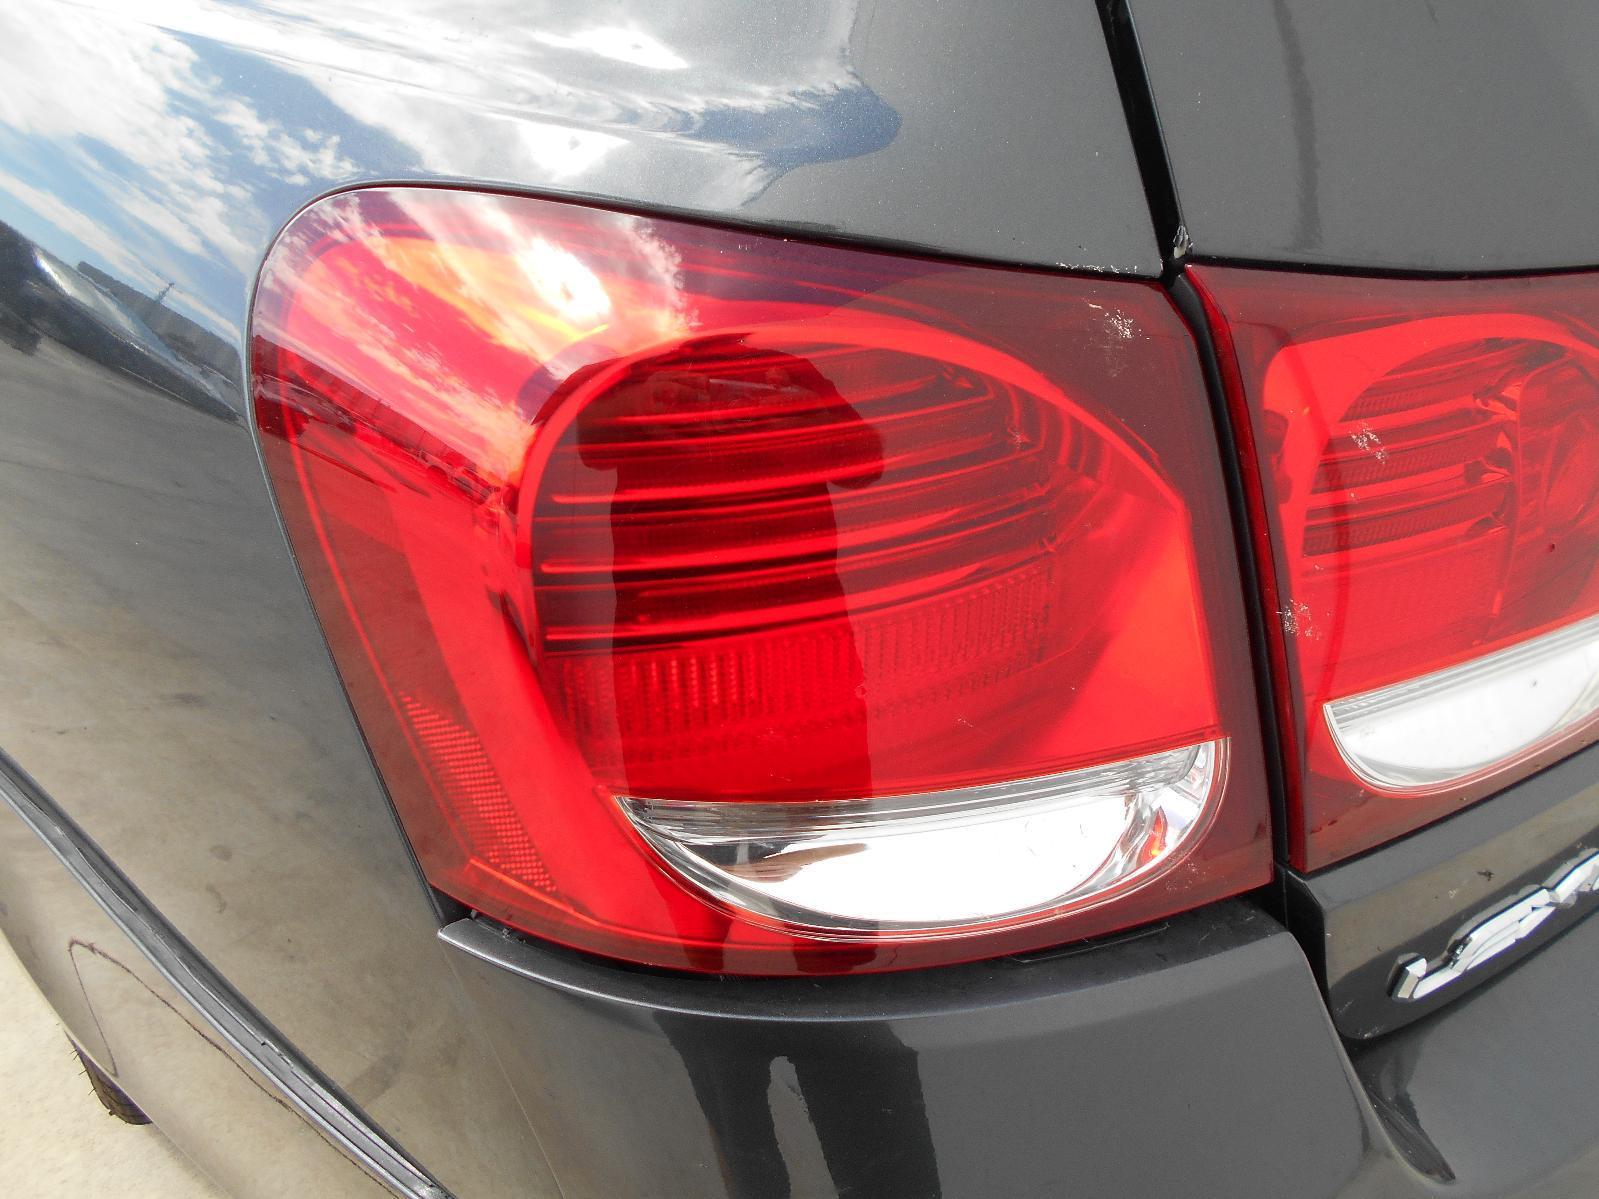 LEXUS GS, Left Taillight, GS300/GS430/GS460, 190 SERIES, 03/05-12/11